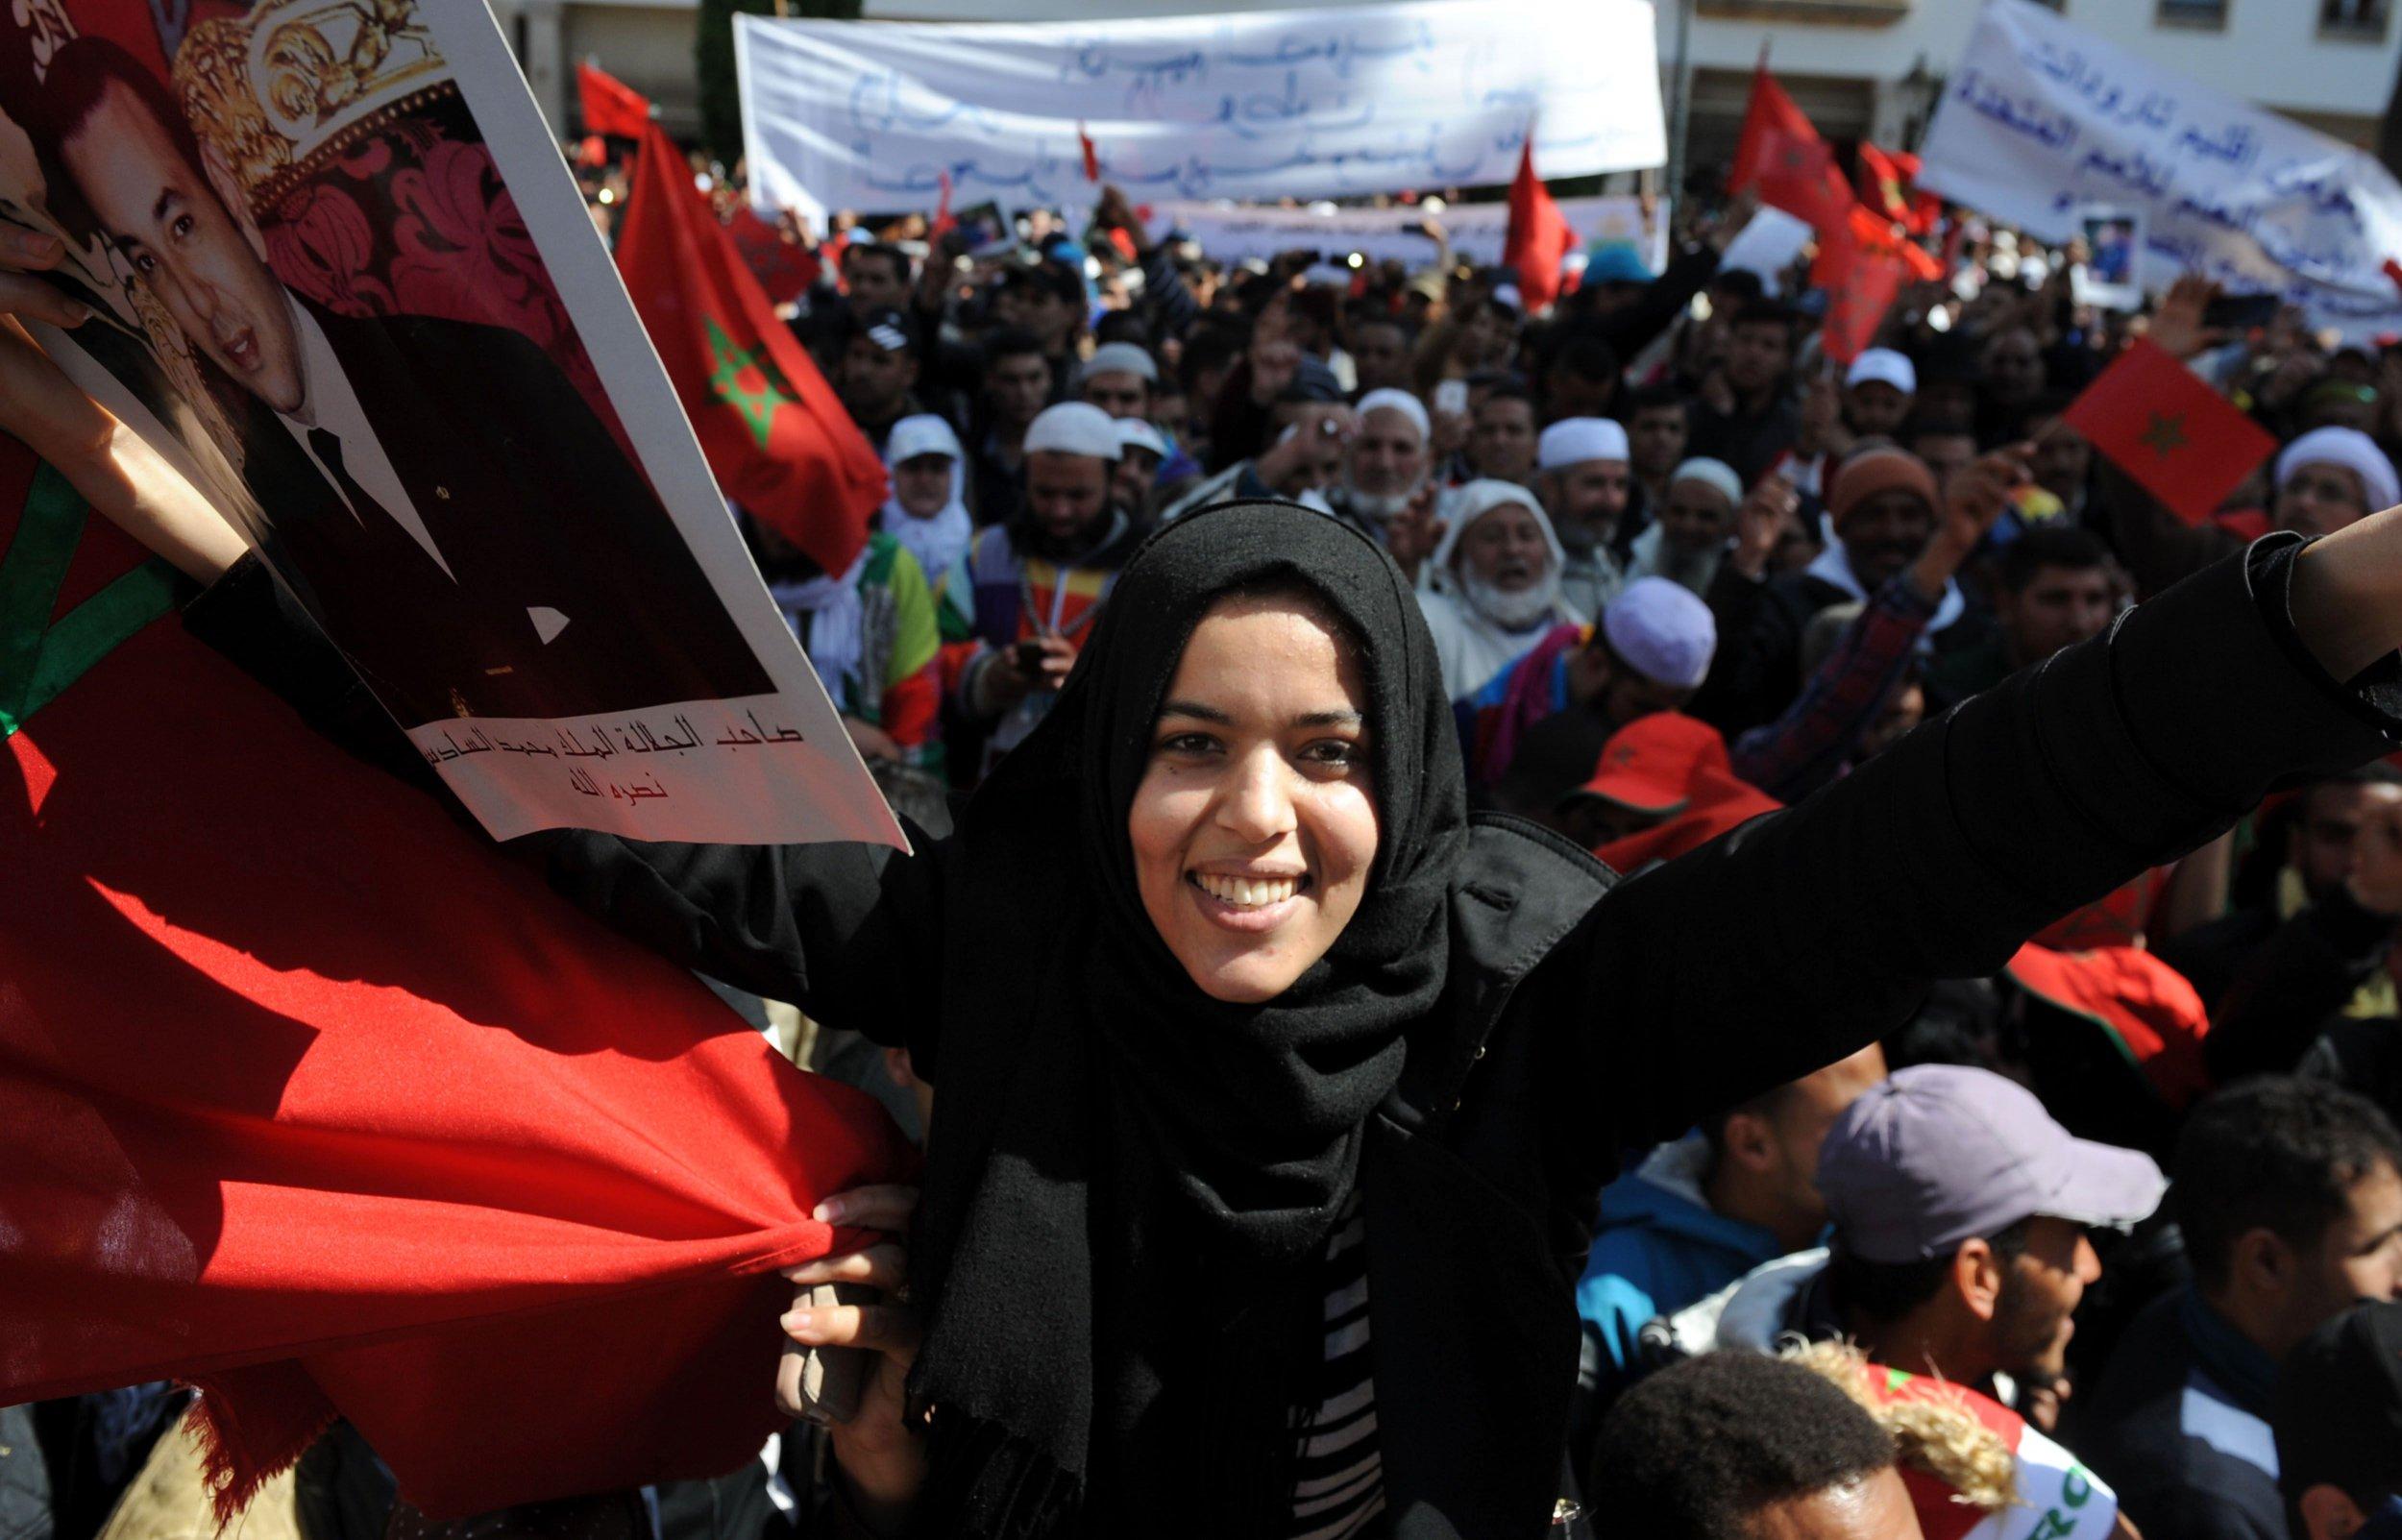 Morocco Western Sahara protest